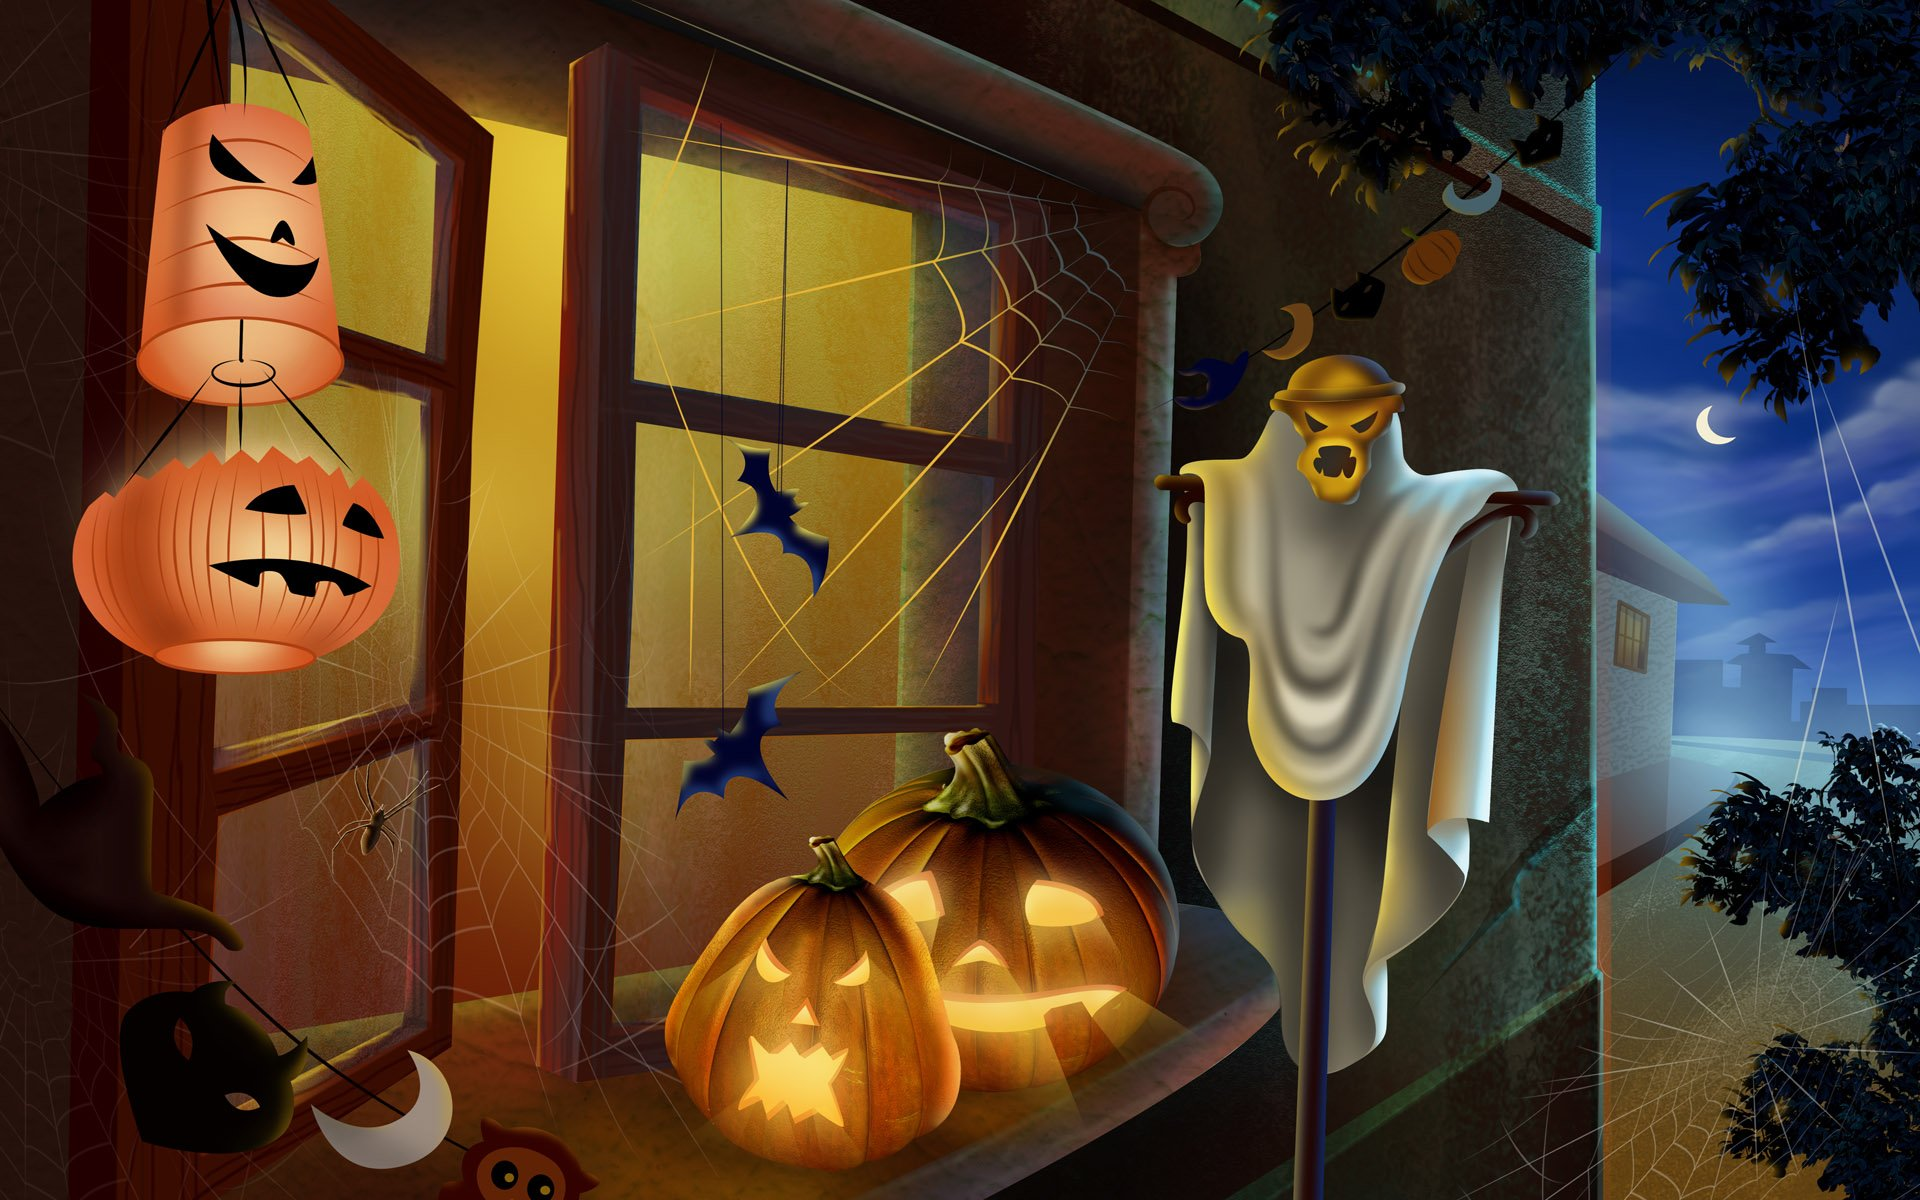 обои на рабочий стол на тему хэллоуин № 1135943 без смс